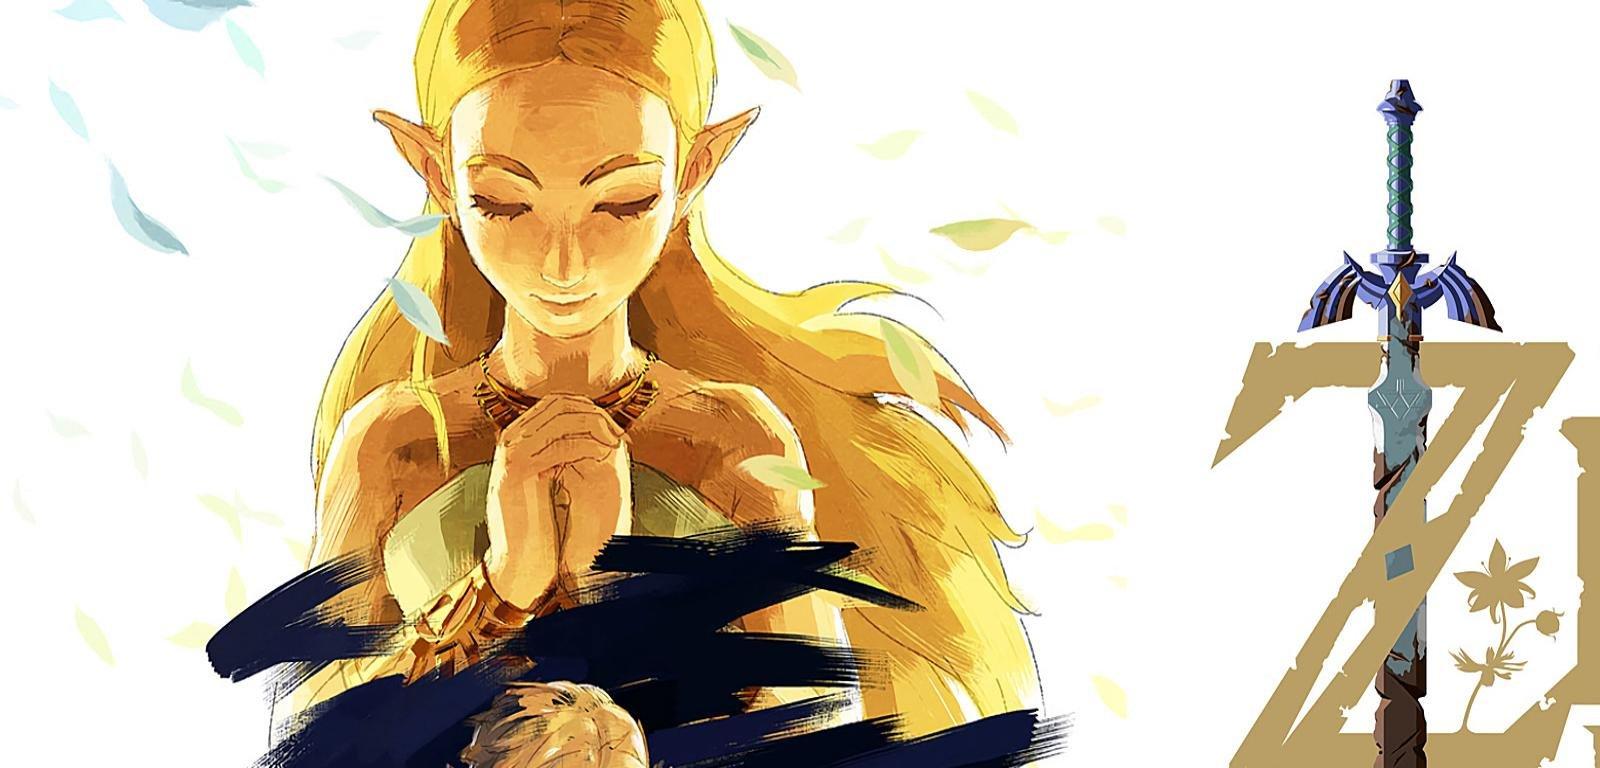 Free Download The Legend Of Zelda Breath Of The Wild Wallpaper Id